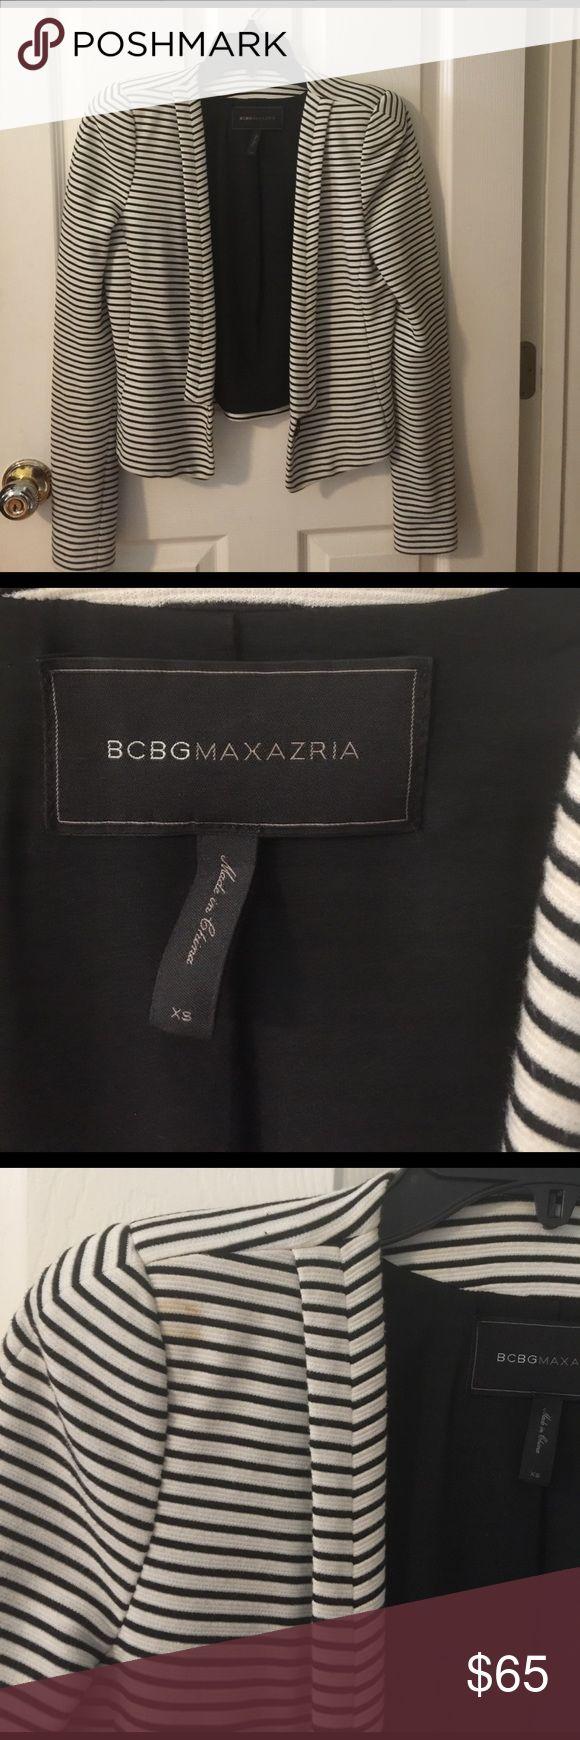 Bcbg Maxazria hendrix striped Blazer Bcbg Maxazria hendrix striped Blazer. Minor make up stain as shown in photo. Dry cleaning should be able to remove it. BCBGMaxAzria Jackets & Coats